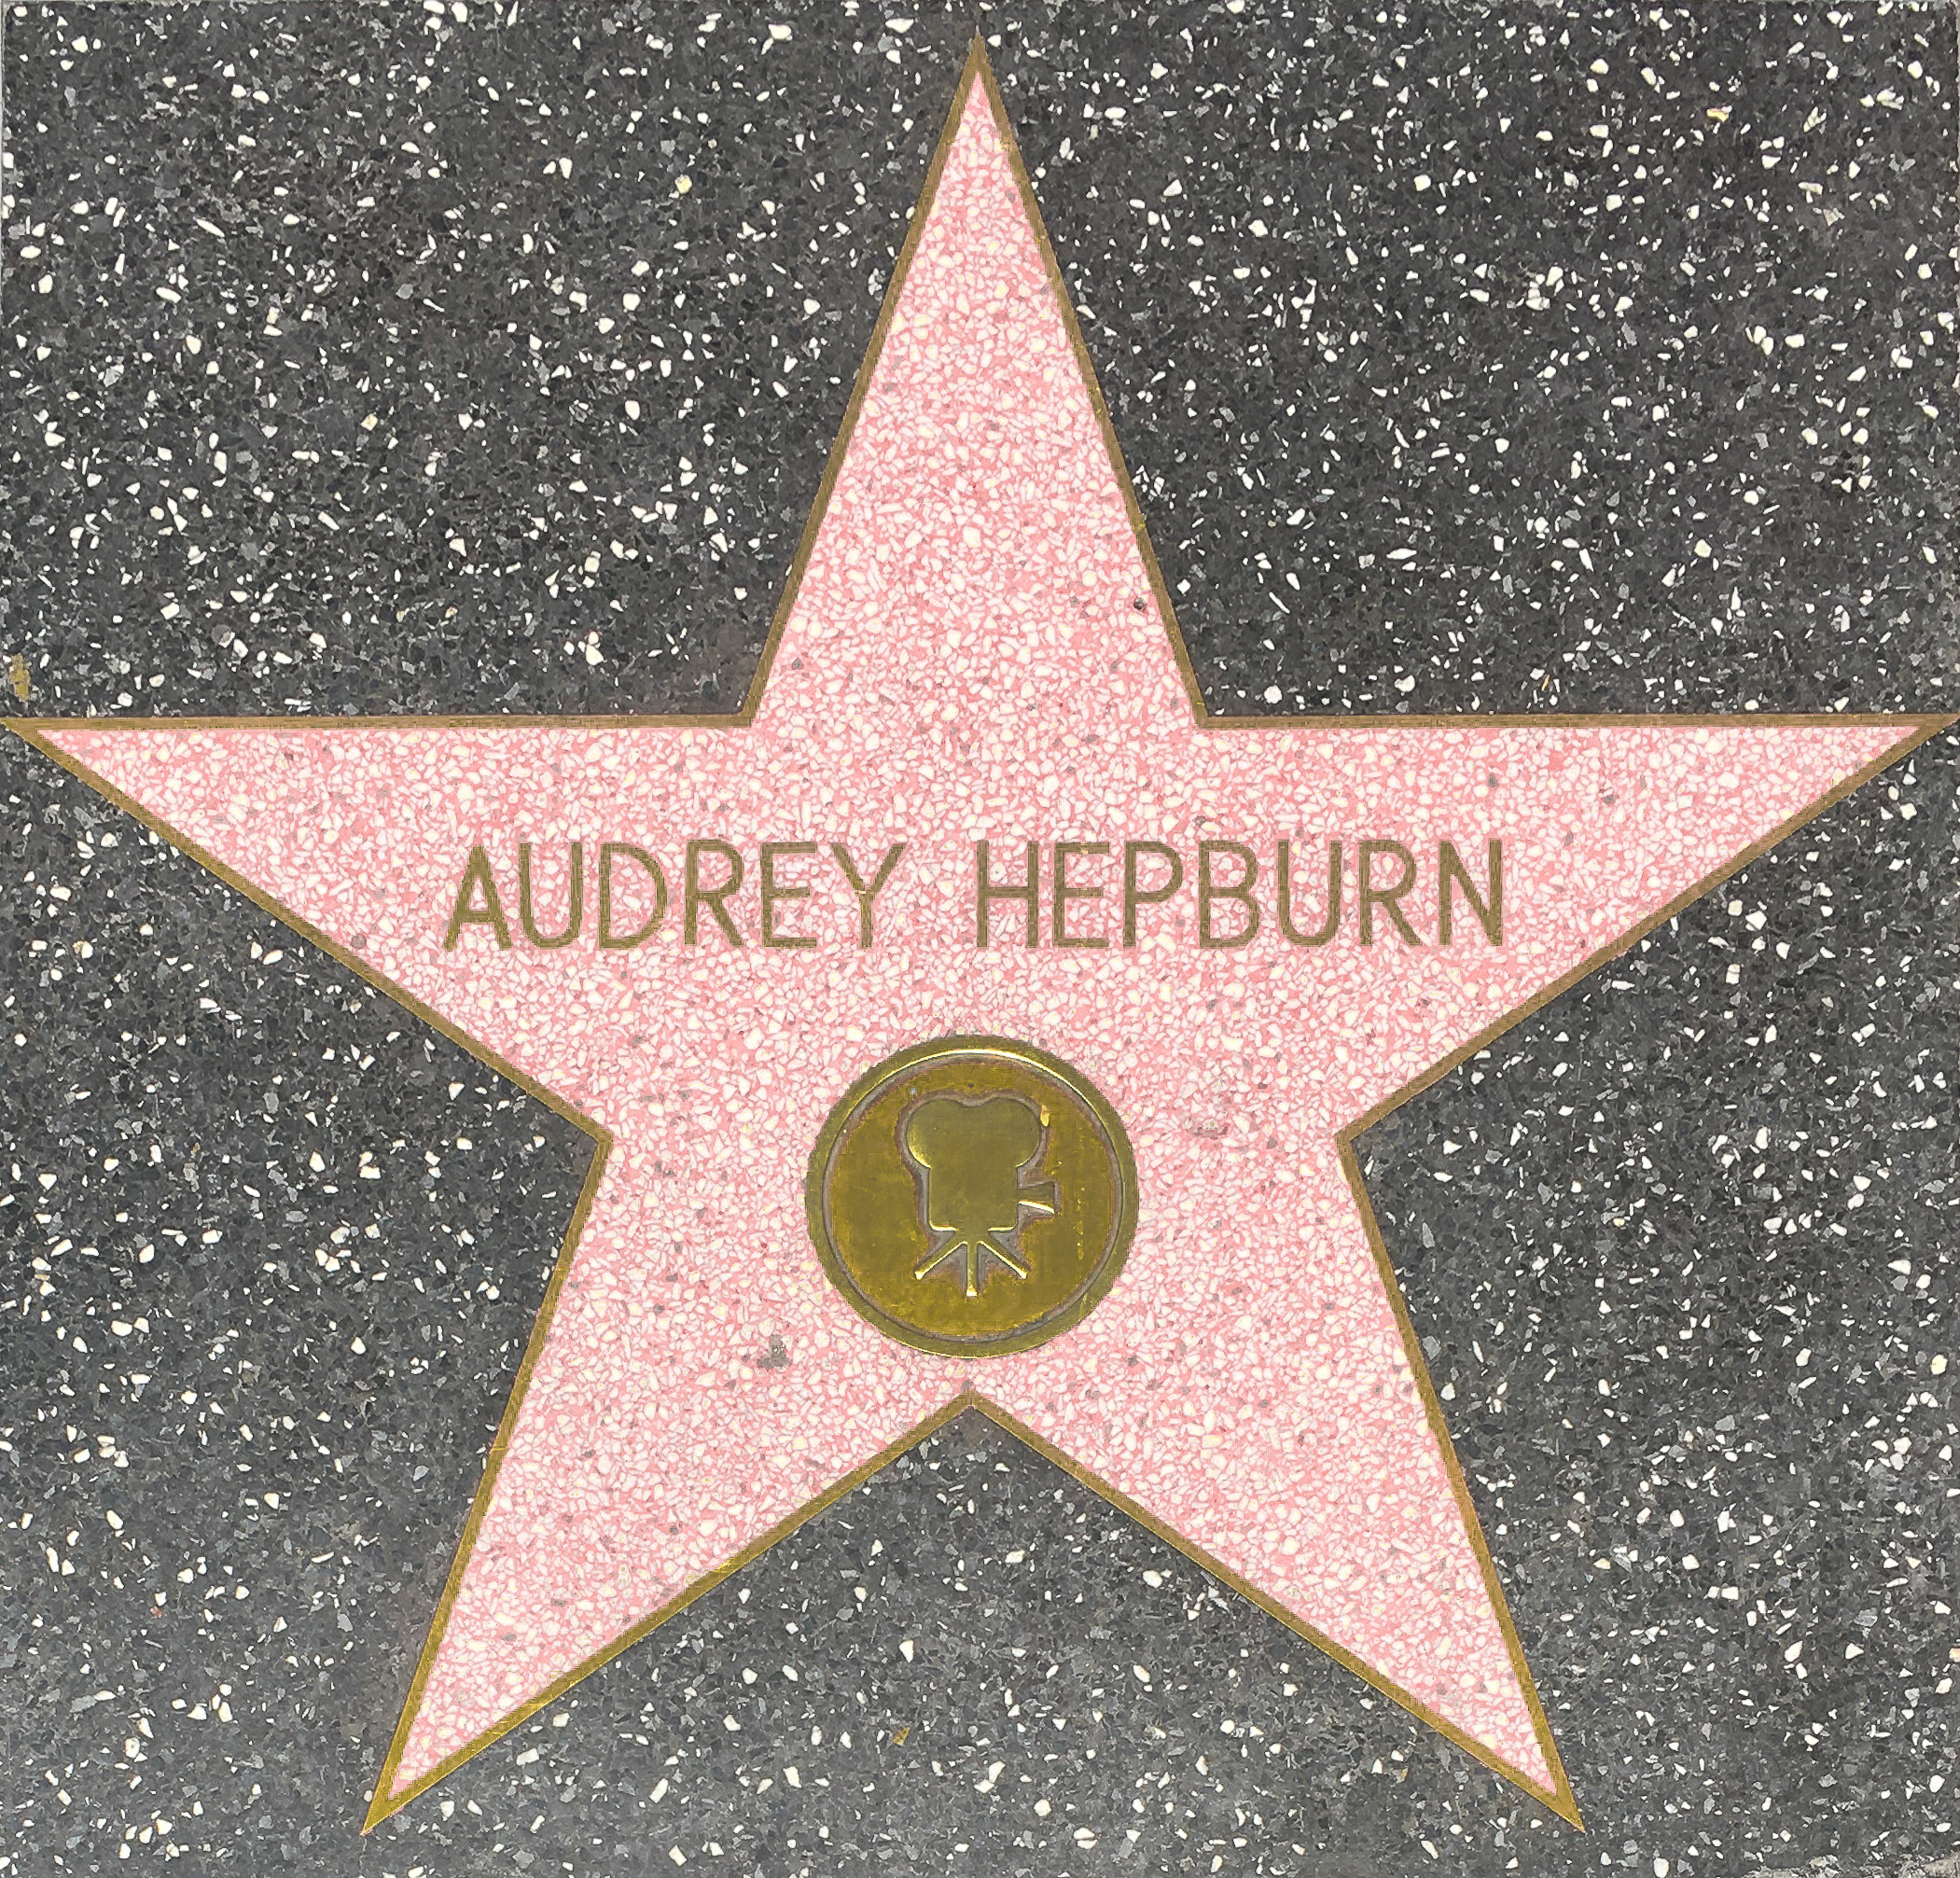 audrey-hepburn-star-hollywood